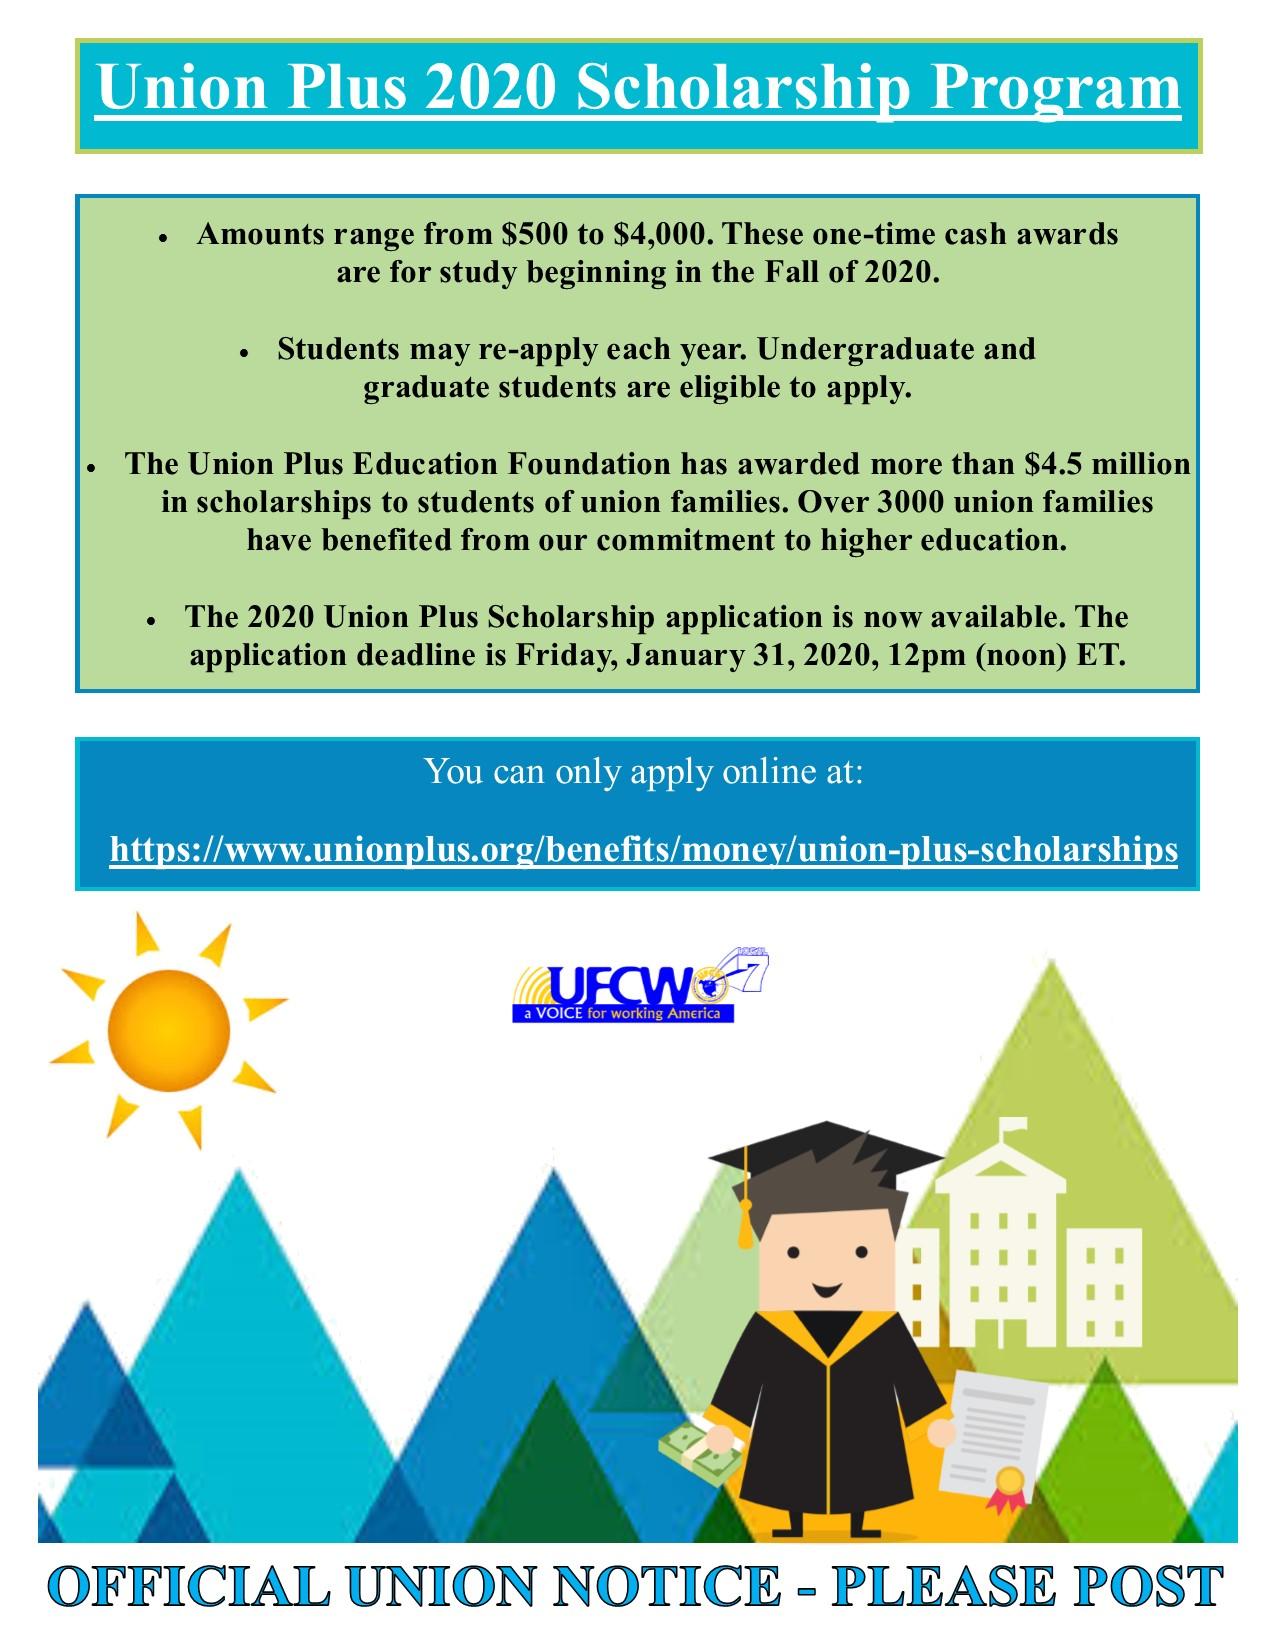 Union Plus 2020 Scholarship Program